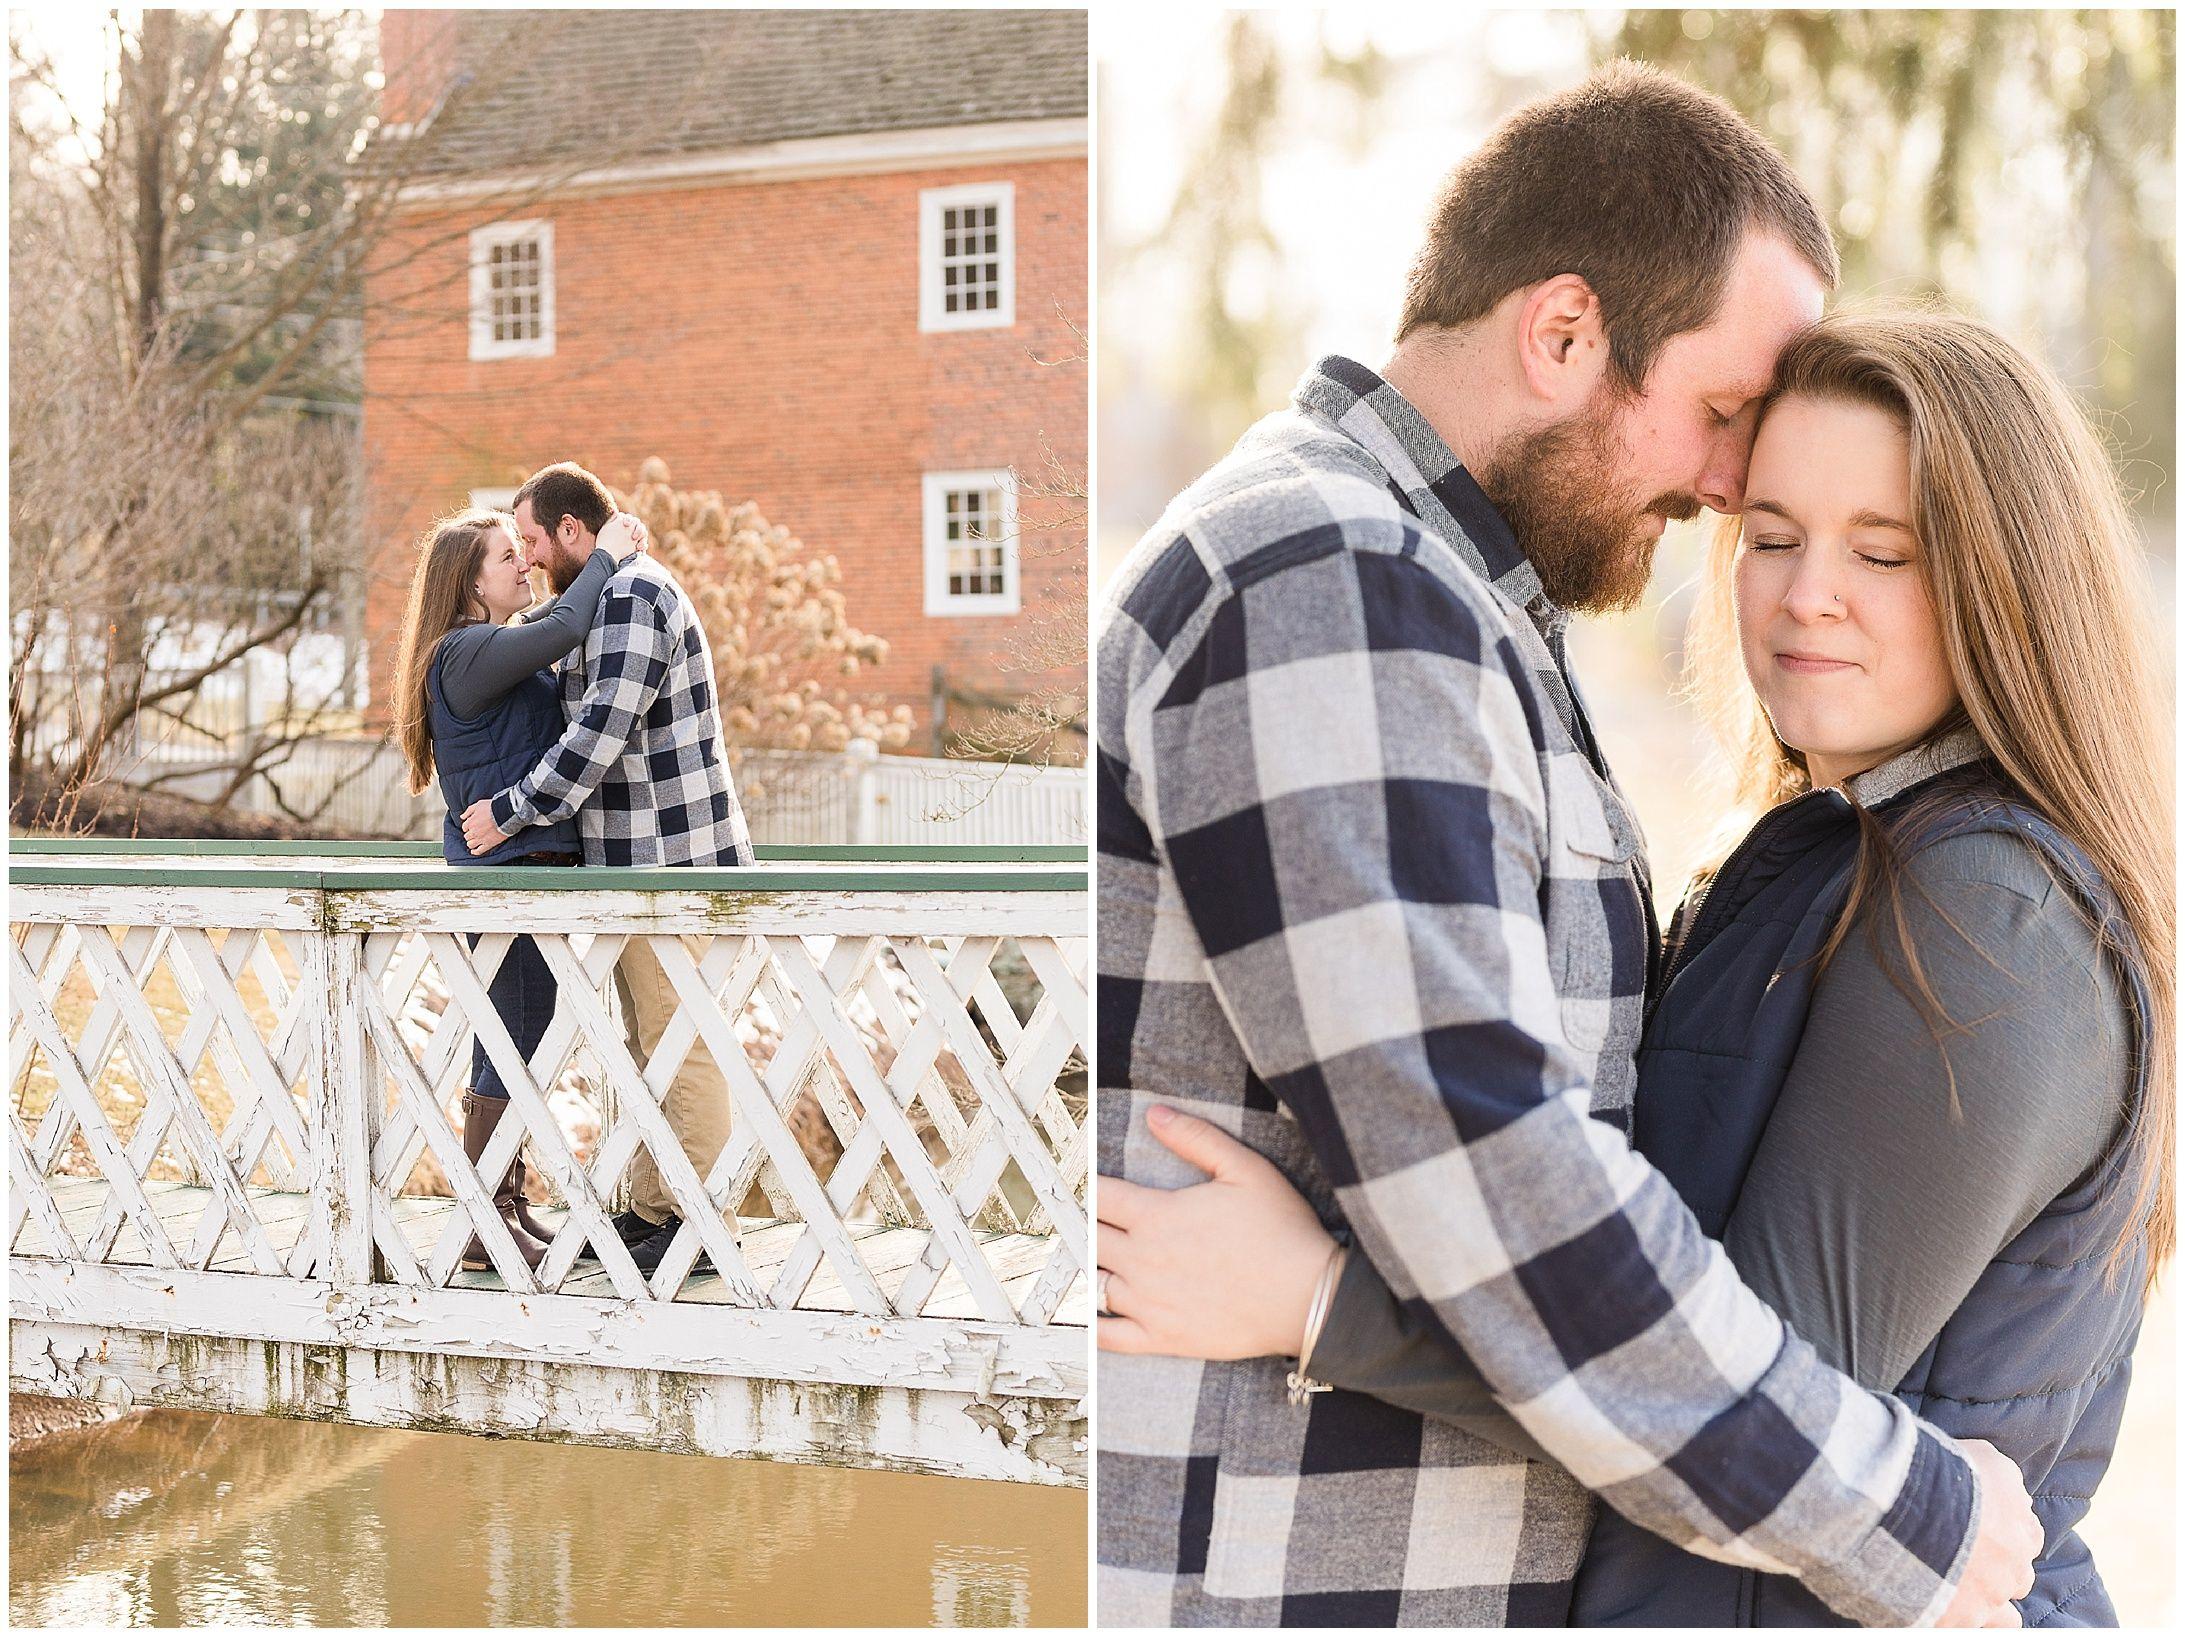 Katelyn & Ryan   Engagement photos, Engagement, Couple photos